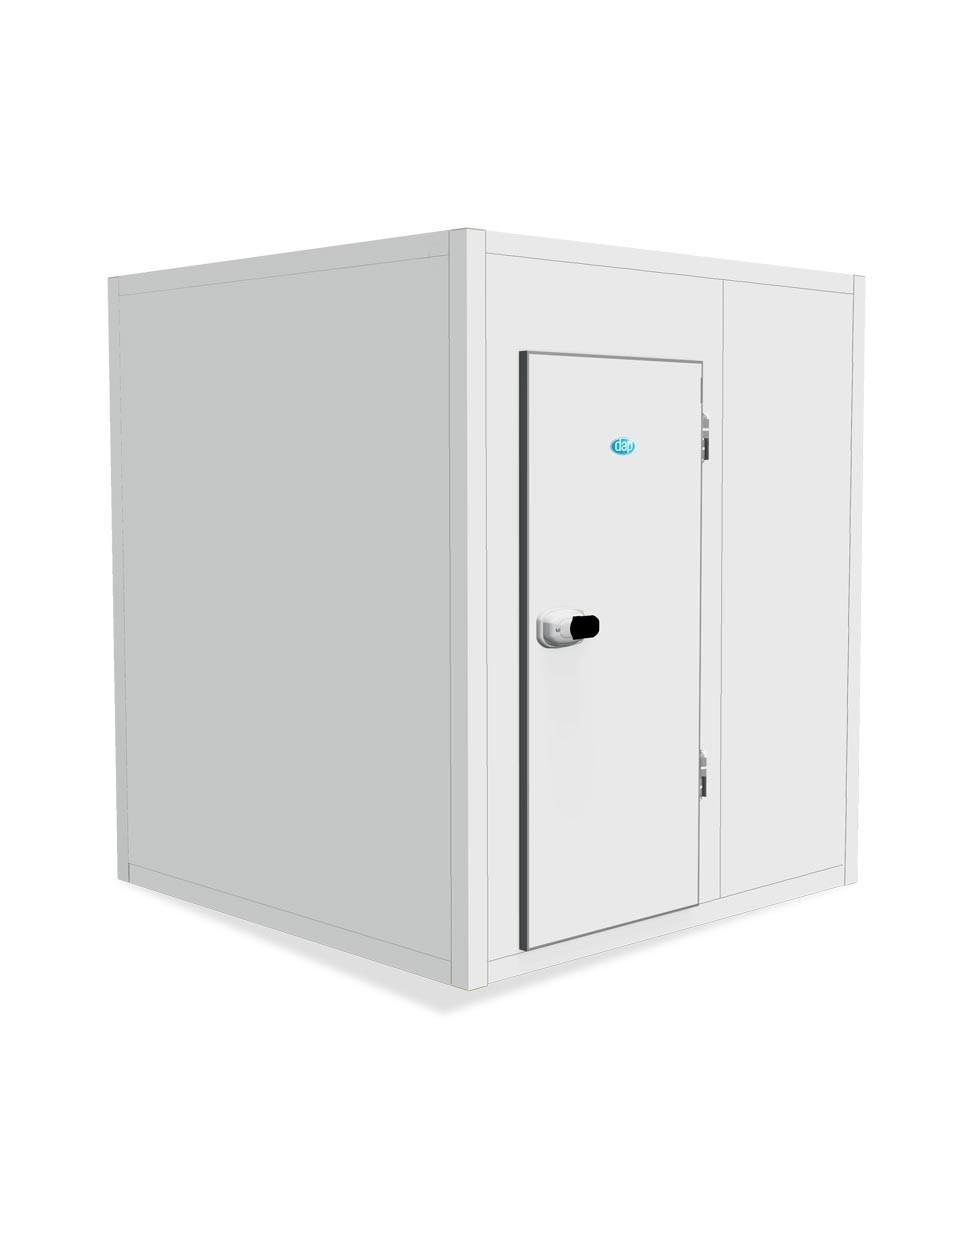 Chambres froides modulaires avec poteaux d'angles